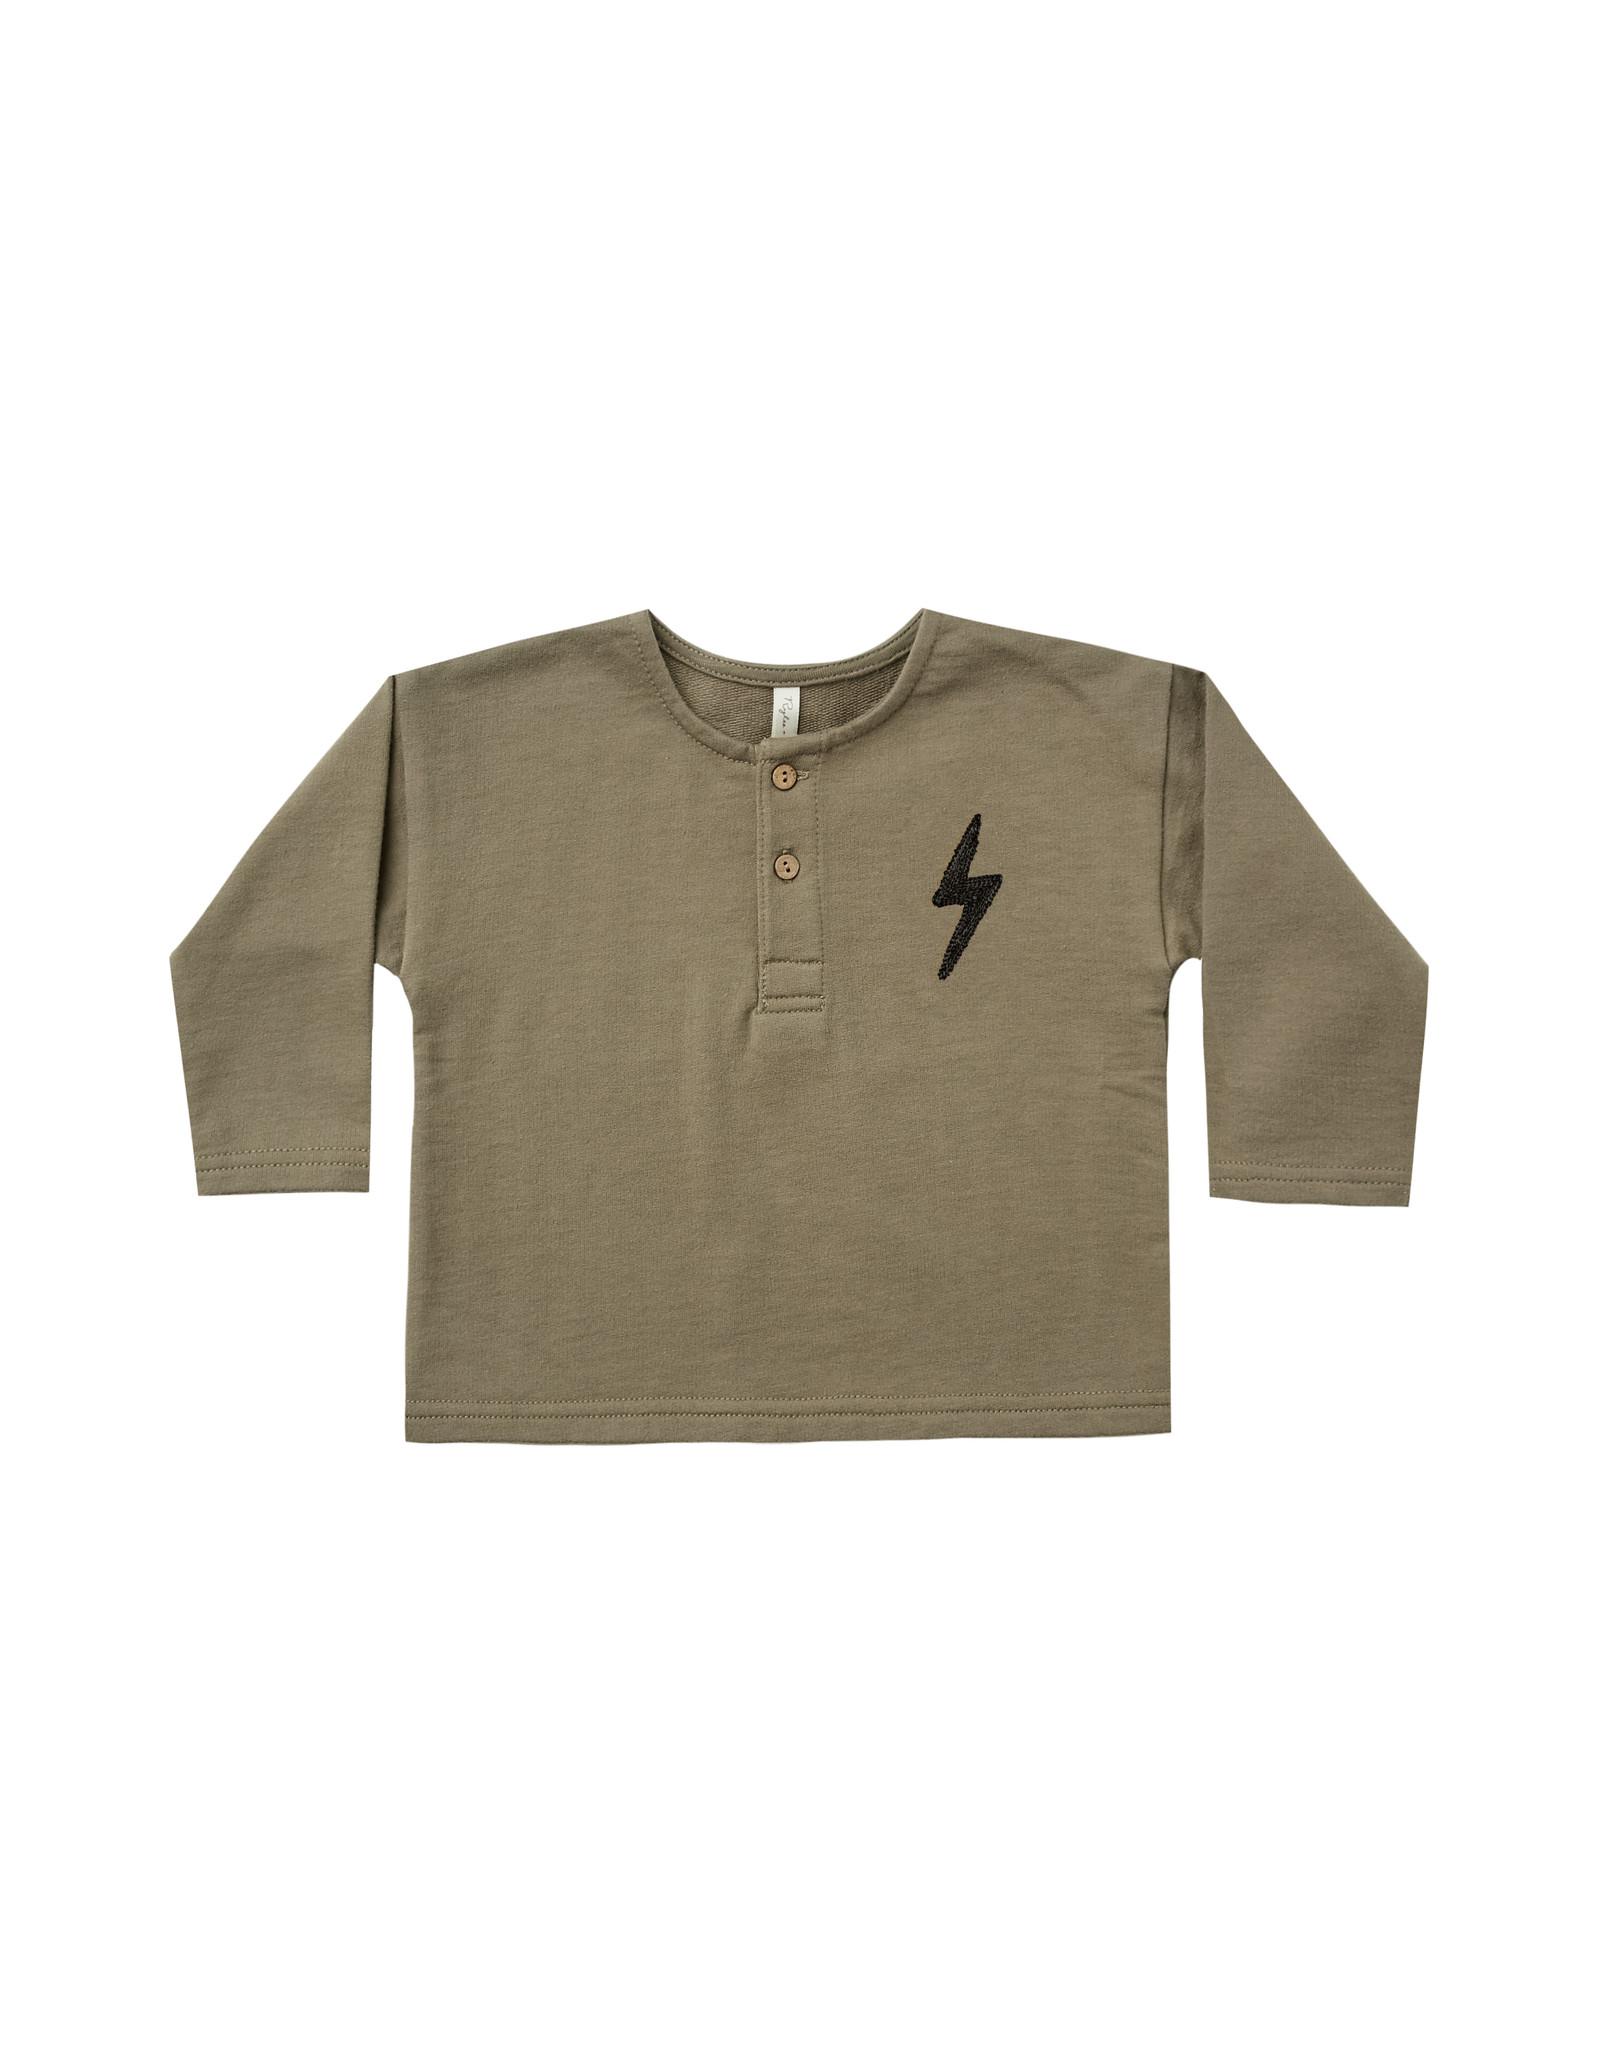 Henley Bolt Sweatshirt